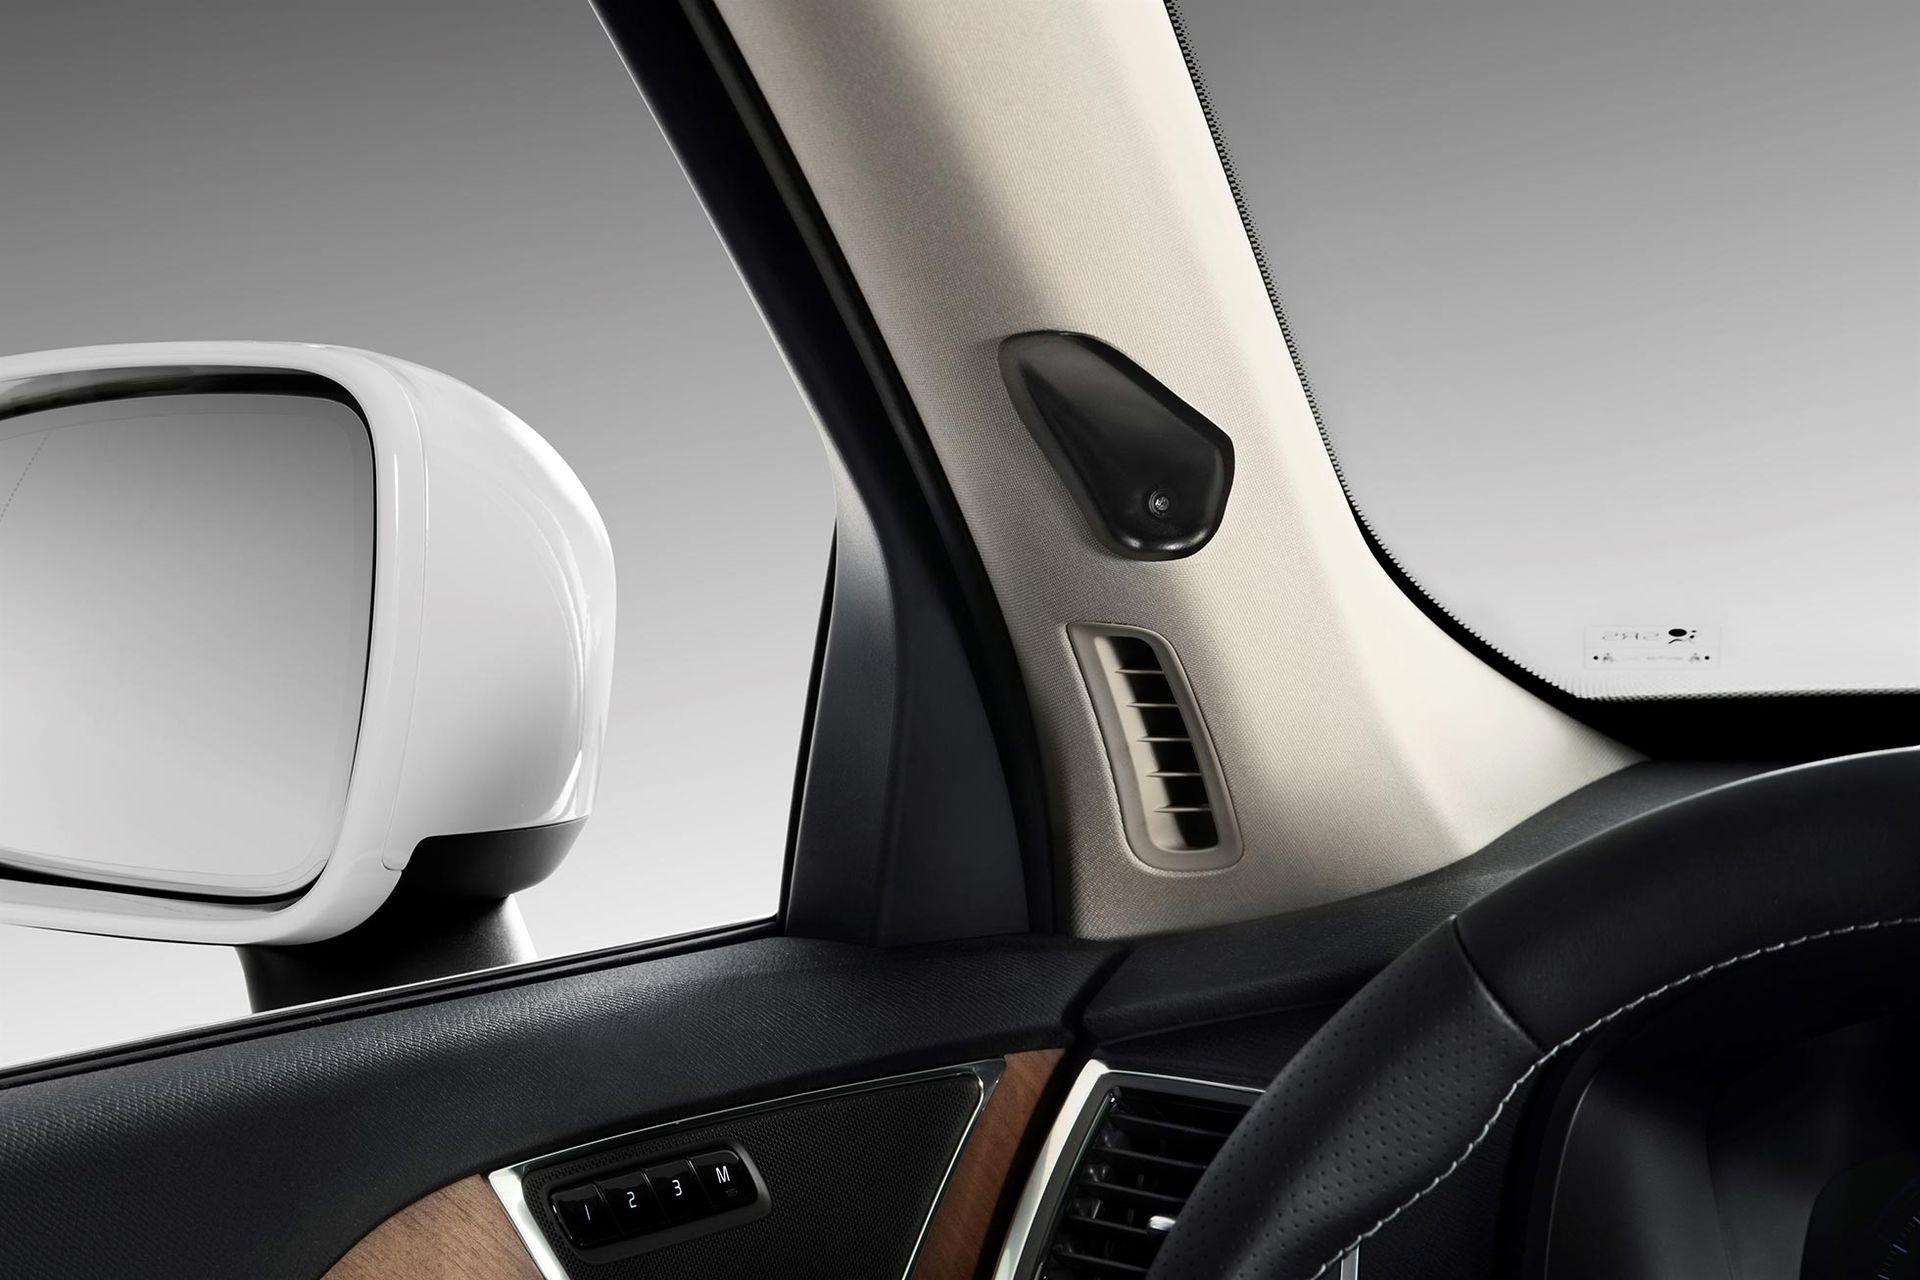 Volvo tror på fler kameror i bilen